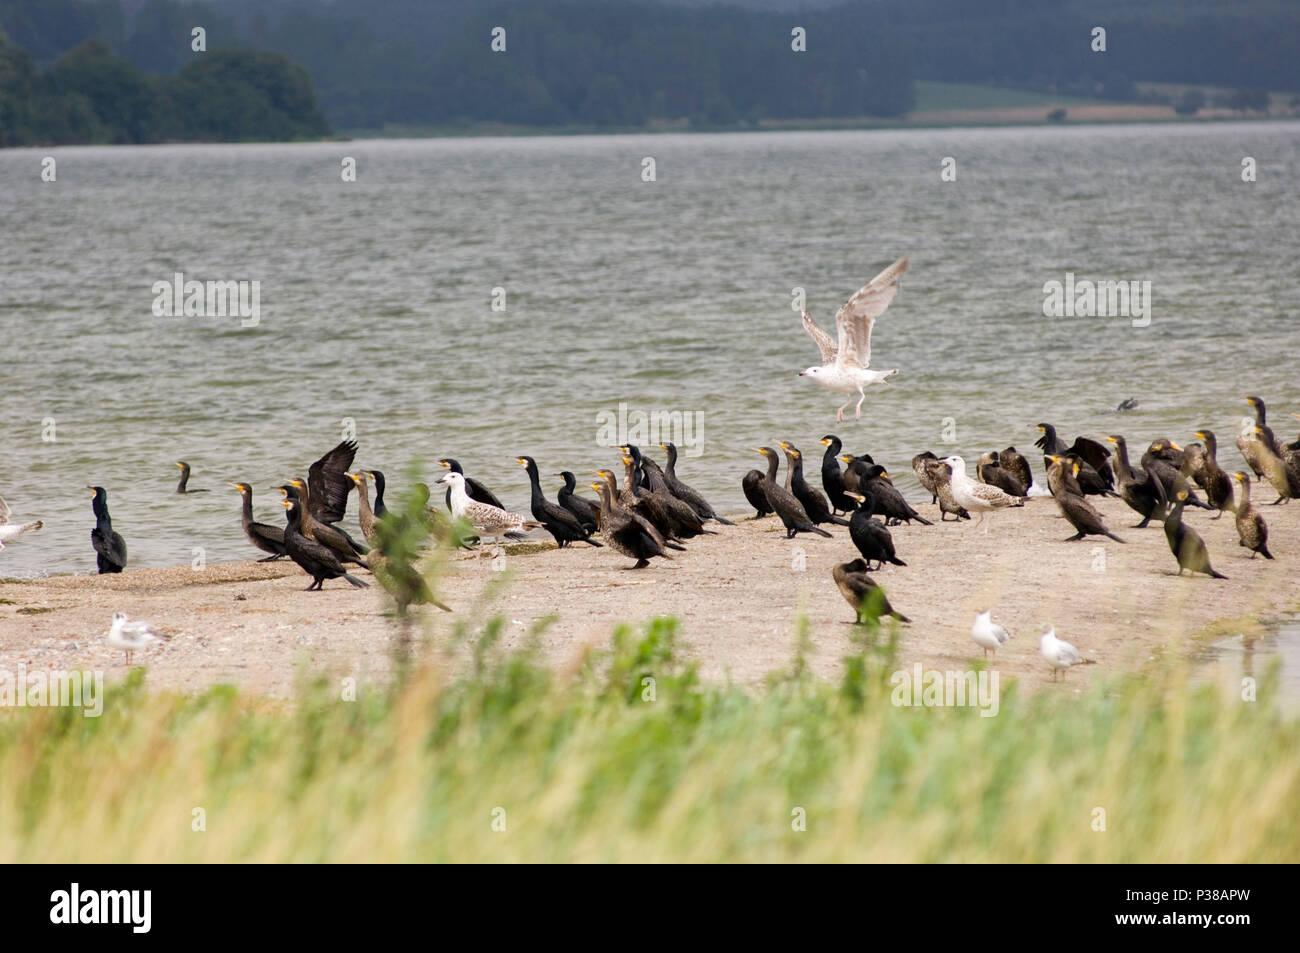 Lauterbach, Germany, Cormorants on the coast of Vilm - Stock Image